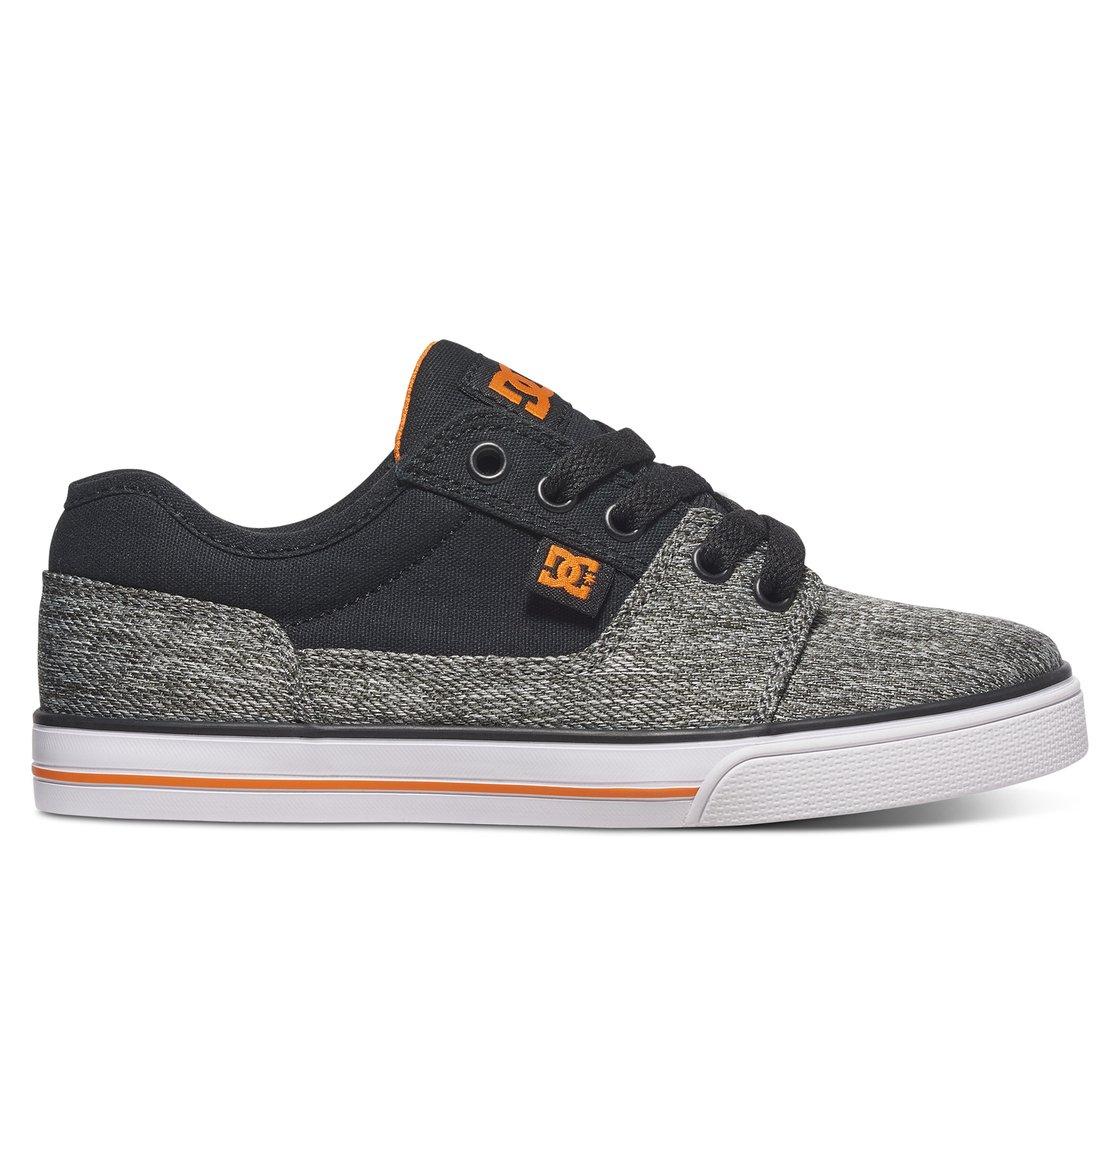 DC Shoes Tonik TX SE - Shoes - Zapatos - Chicos - EU 36.5